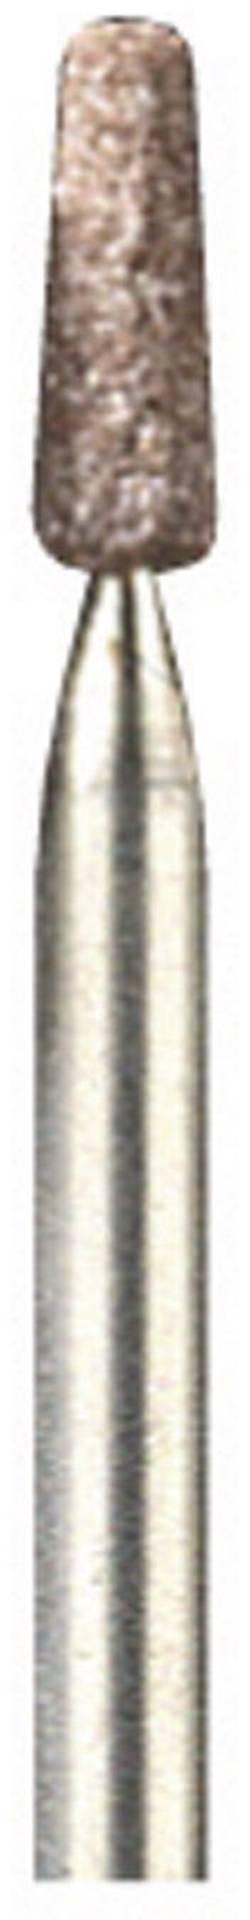 Fraise, pointe en corindon Ø3,4 mm Dremel 997